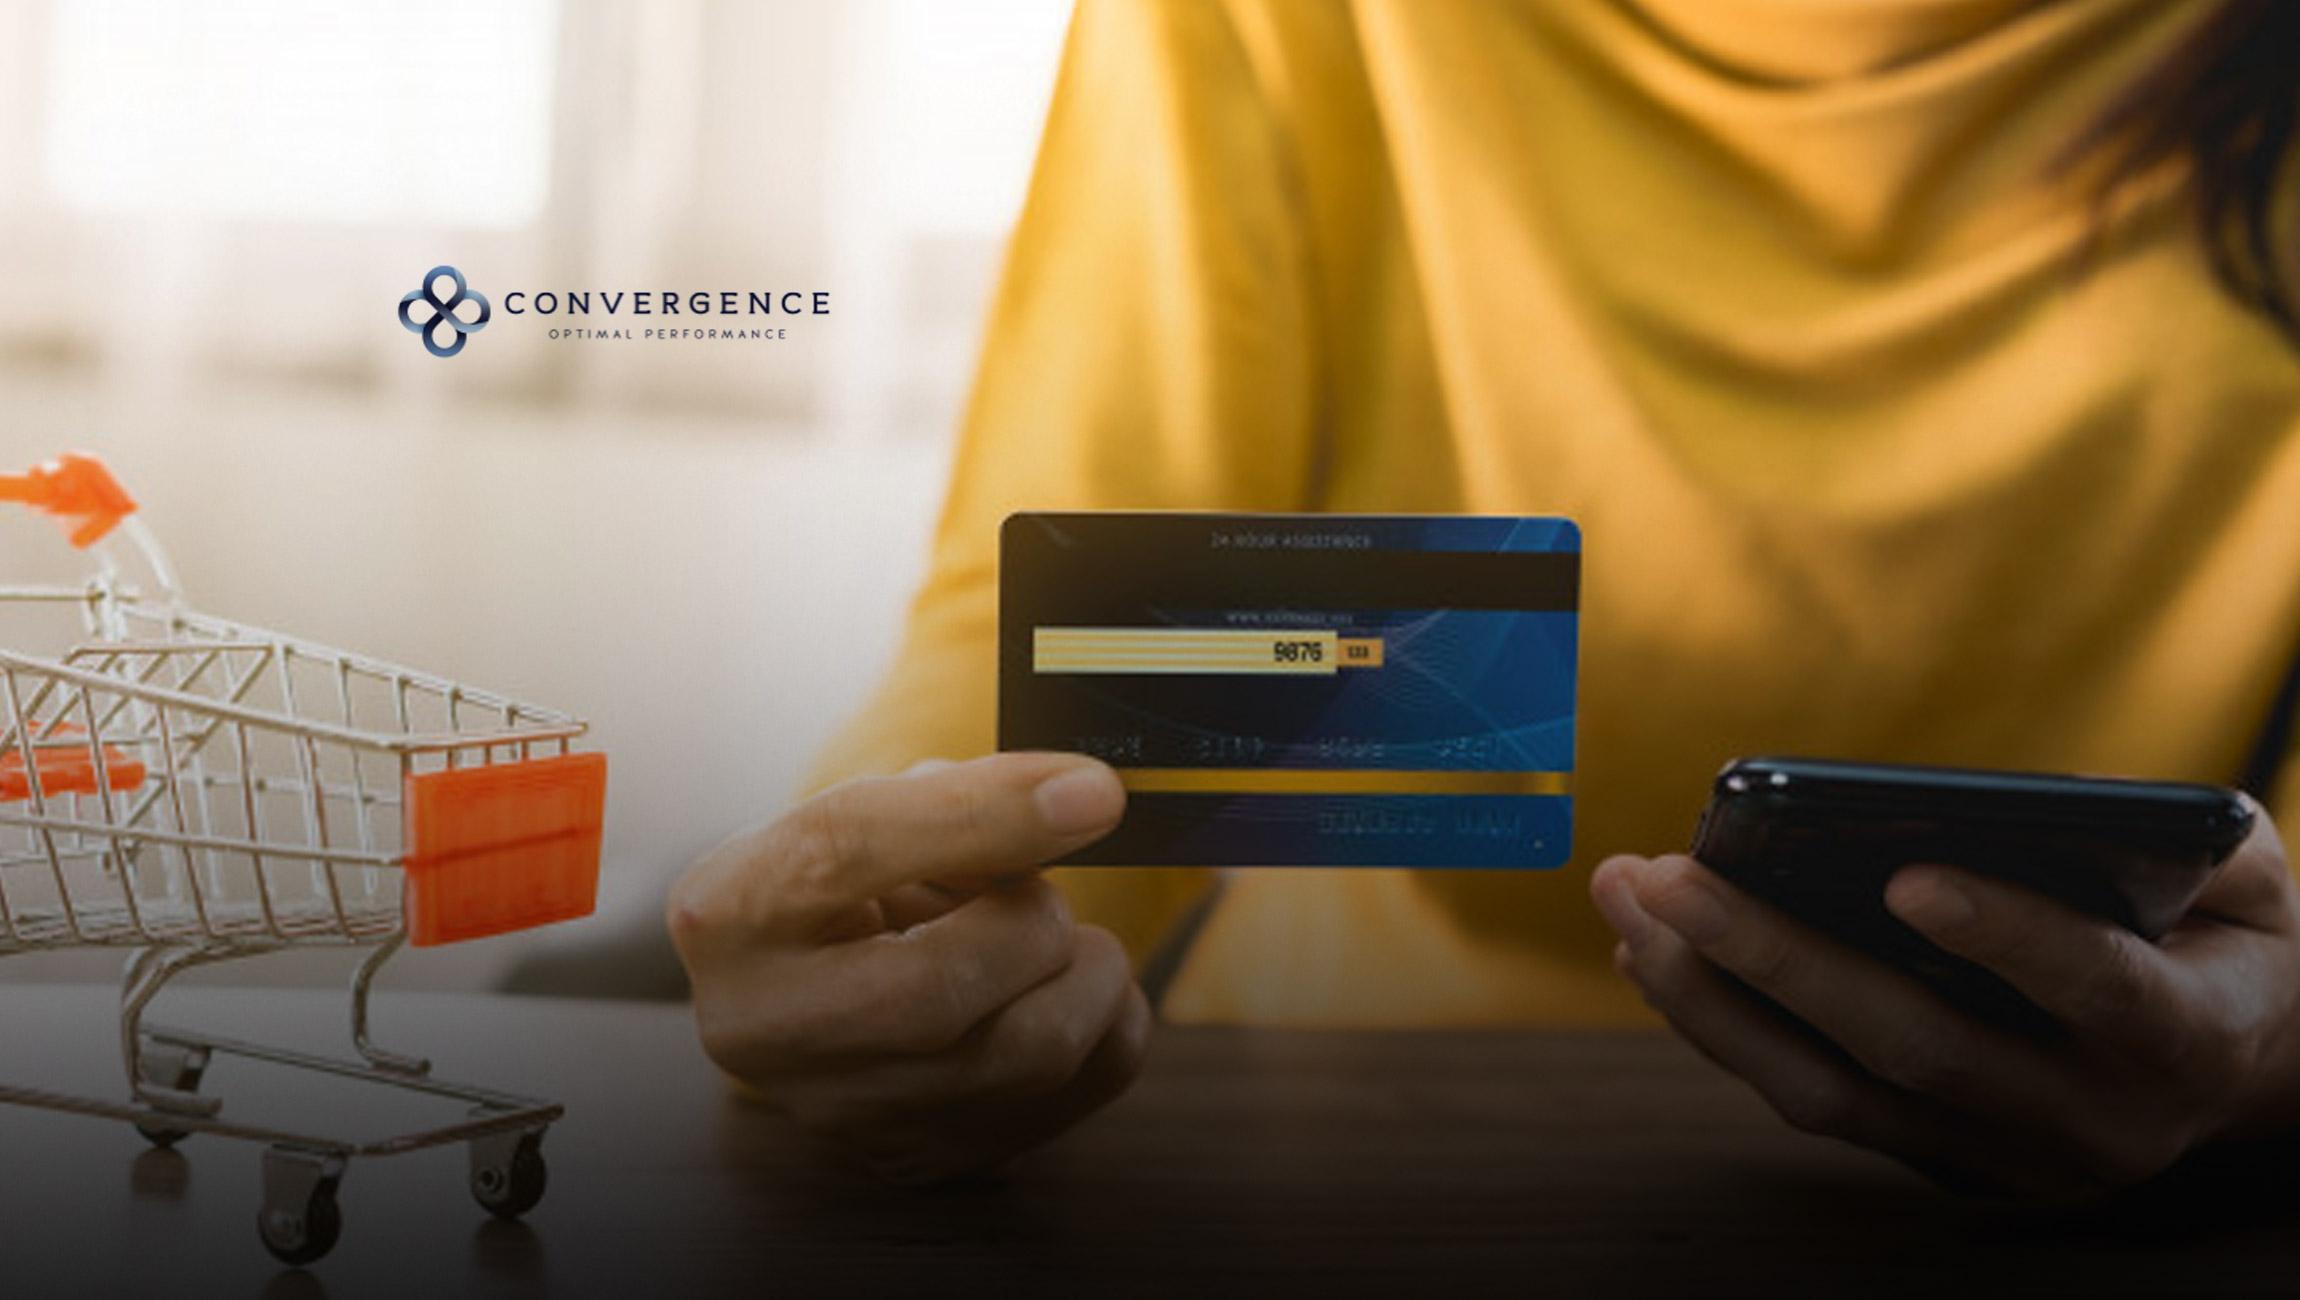 Convergence Inc. Announces the Launch of its E-Commerce Platform